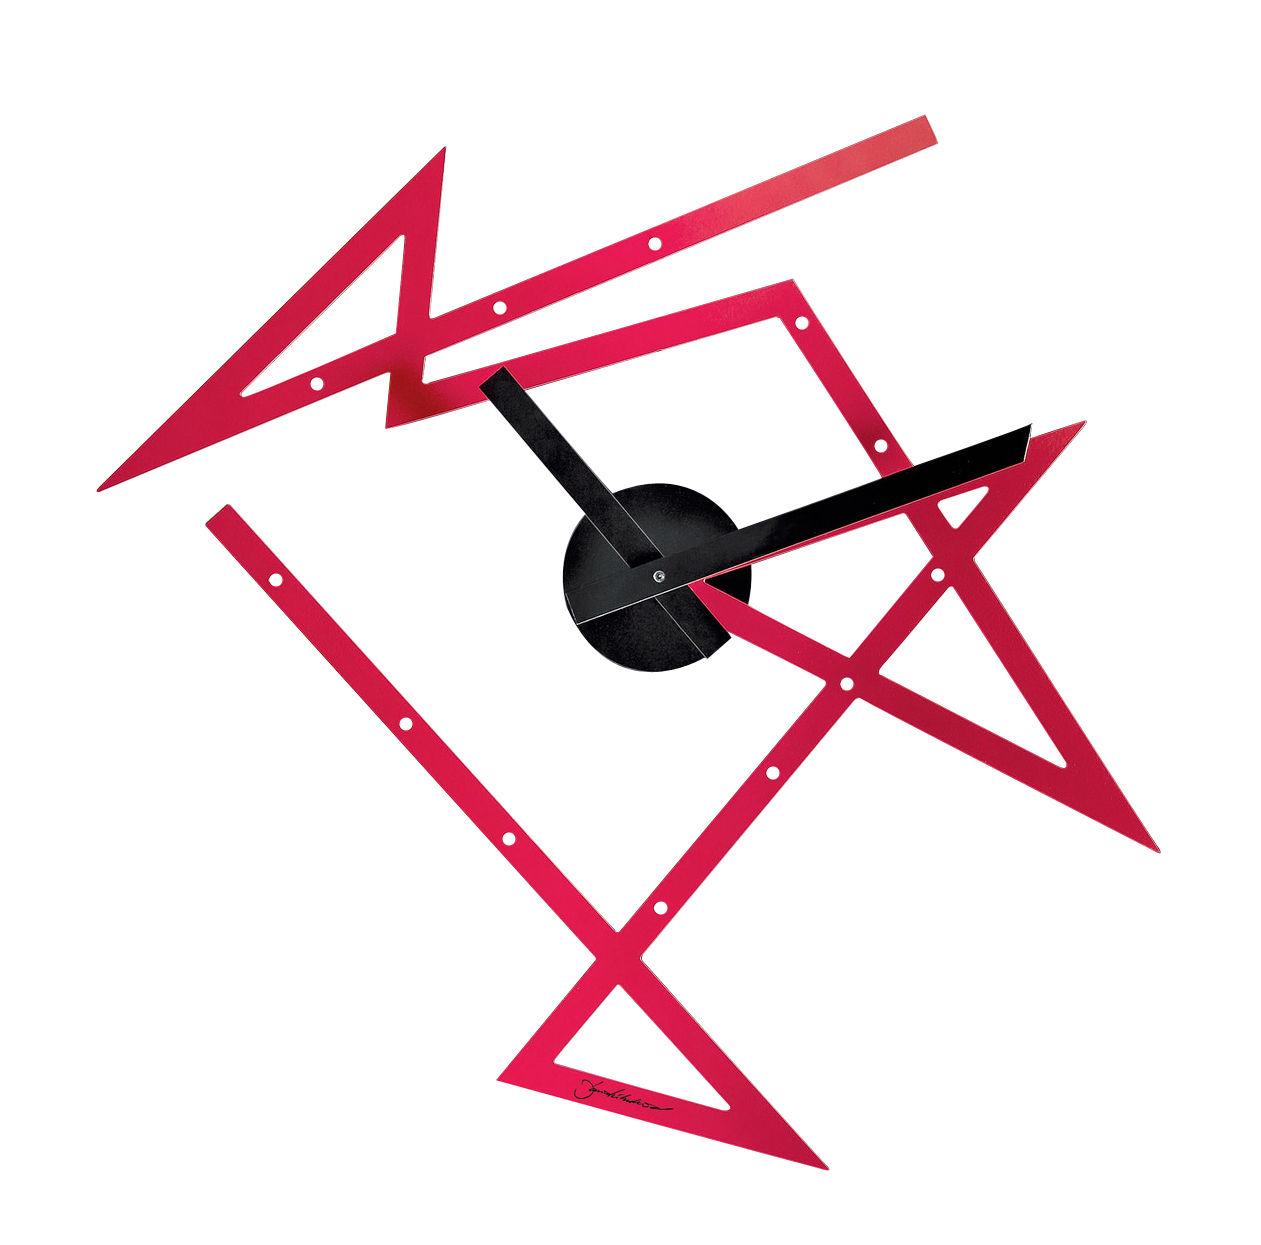 Decoration - Wall Clocks - Time Maze Wall clock - 50 x 47.5 cm by Alessi - Red / Black - Steel